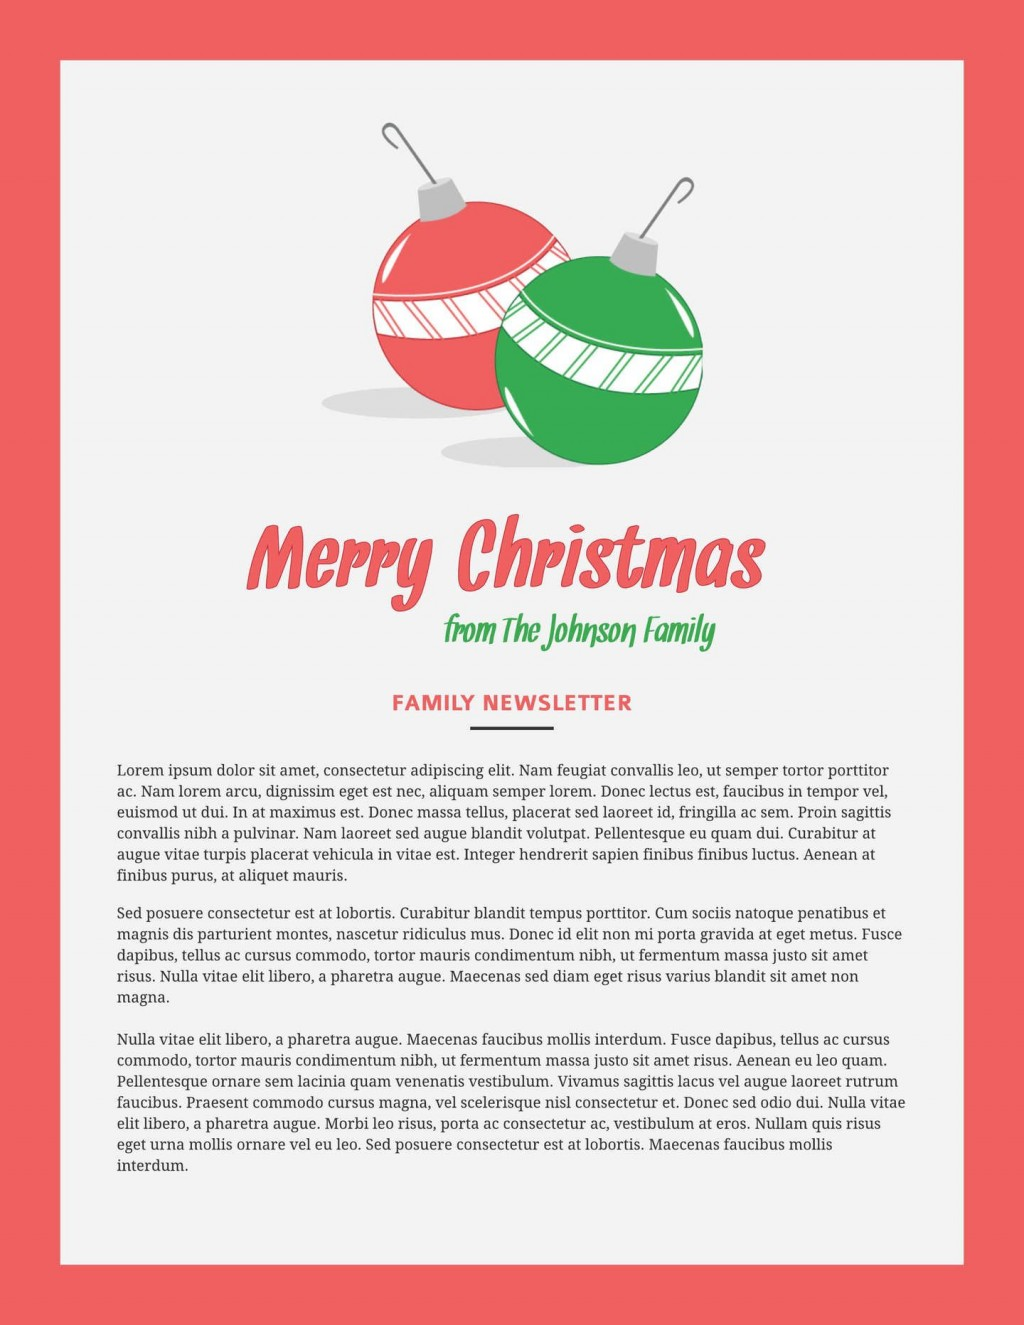 007 Impressive Free Christma Newsletter Template Microsoft Word High Resolution Large